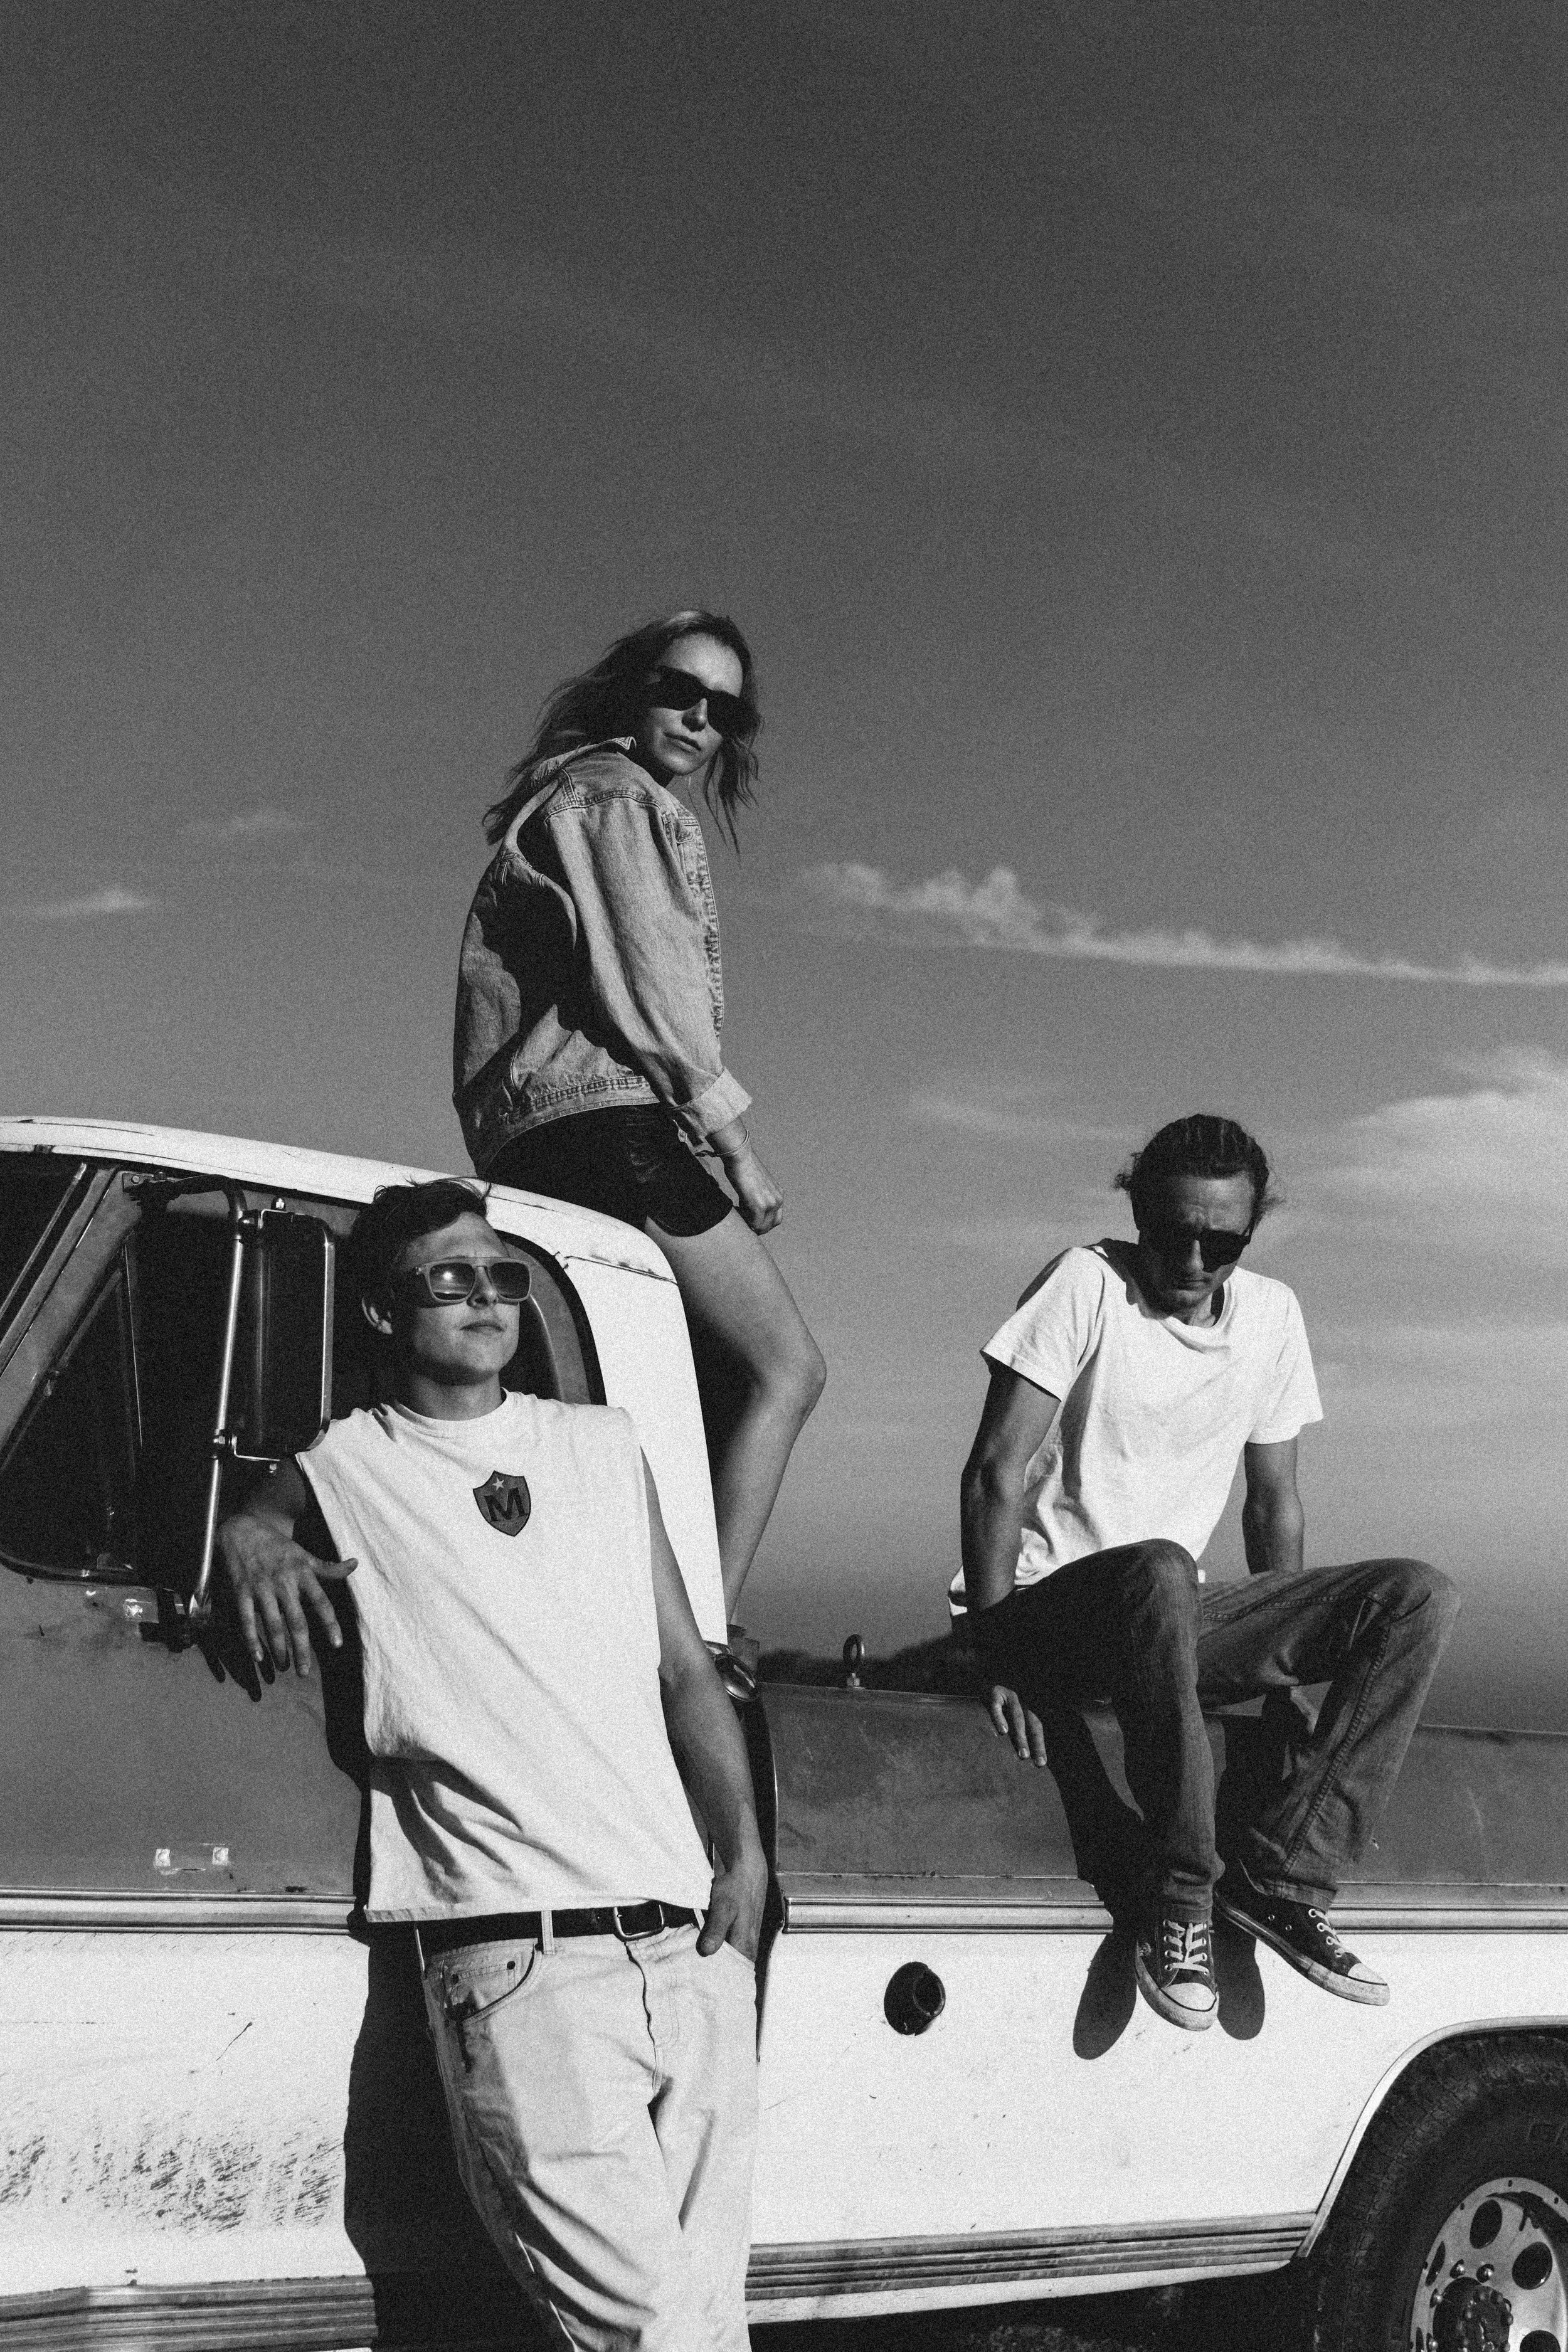 Goktug Kral-Fashion Photography_Los Angeles 63.jpg